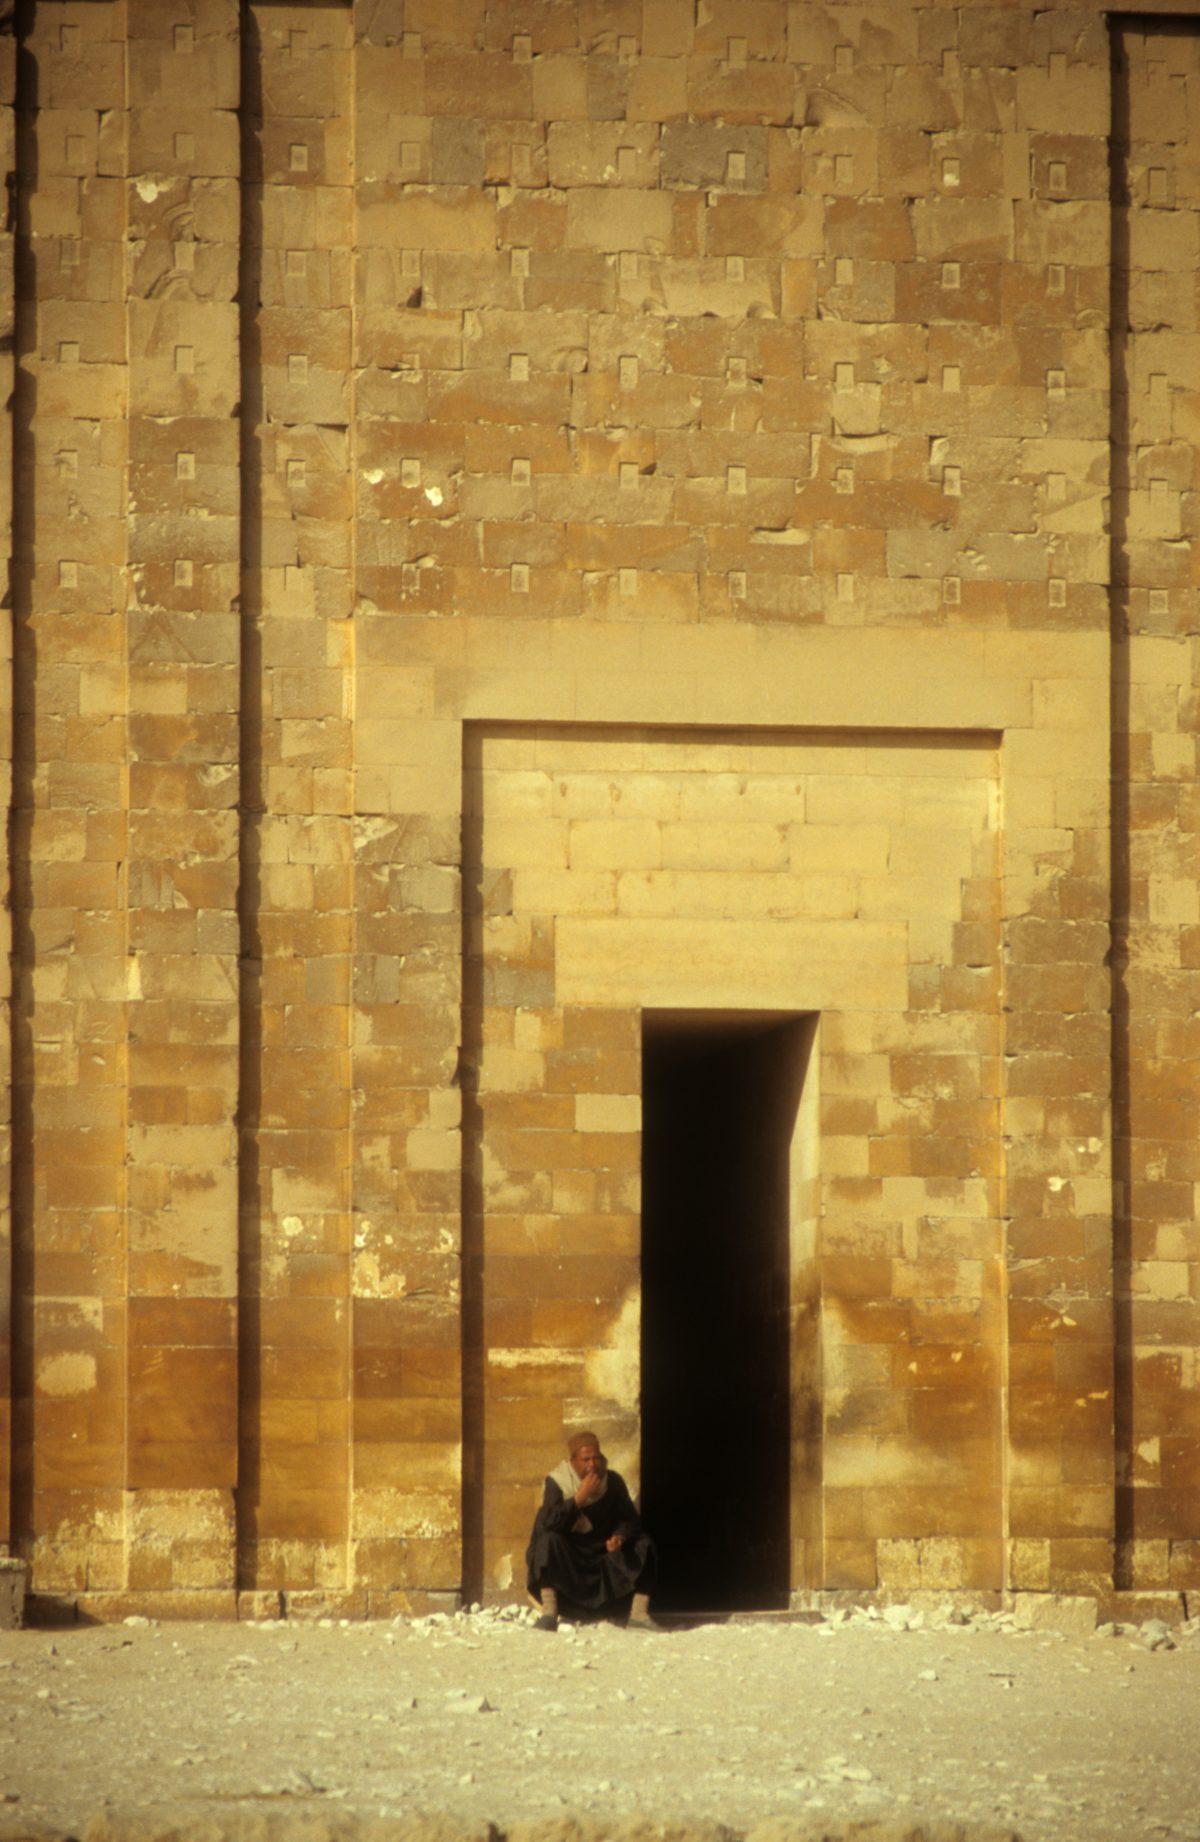 door, male, landmark, sand